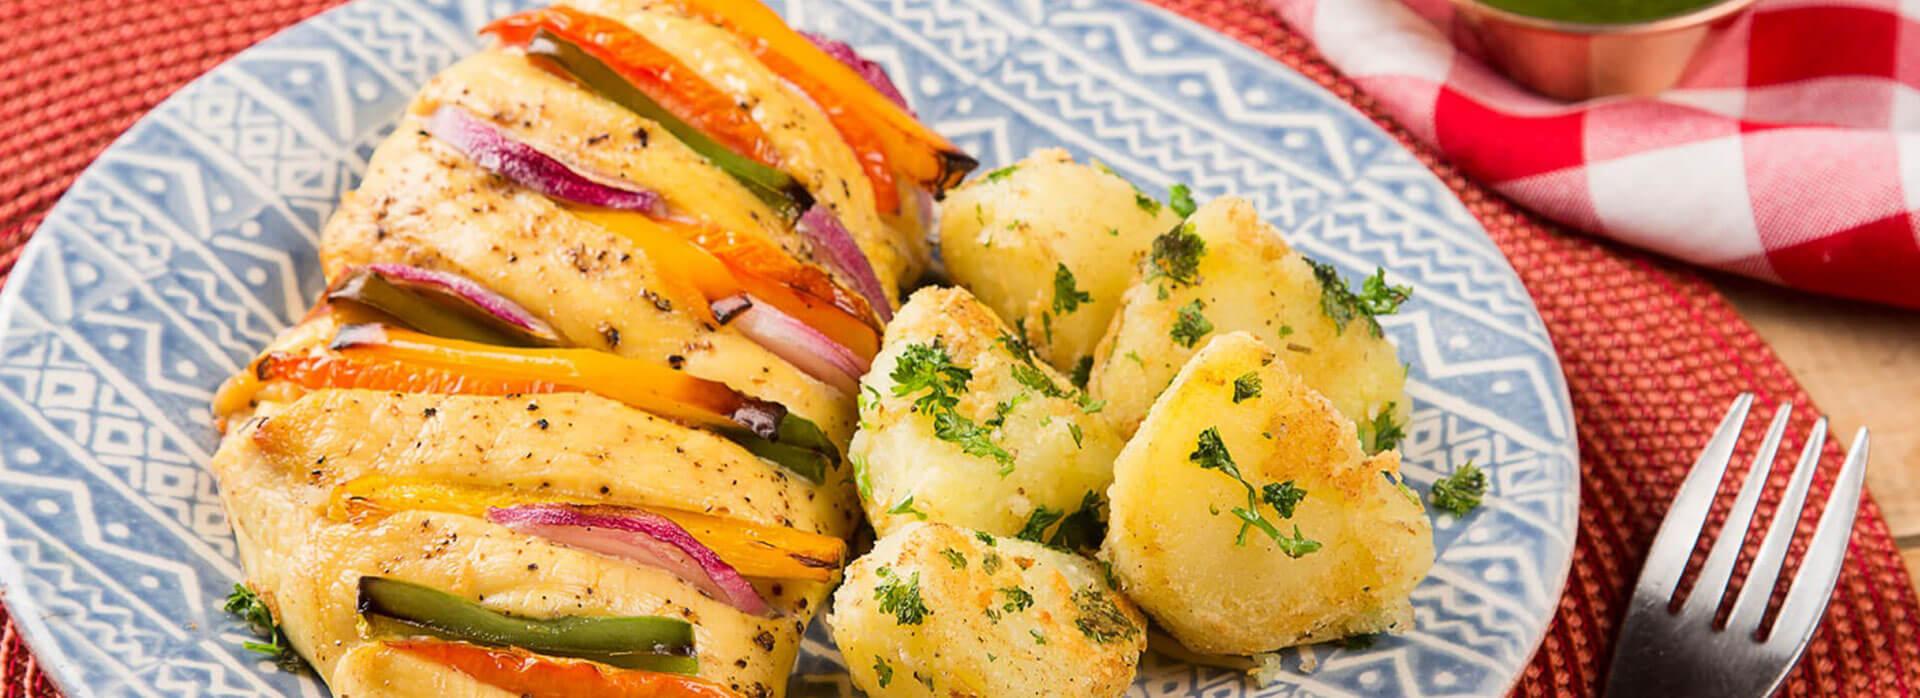 Pechuga con vegetales